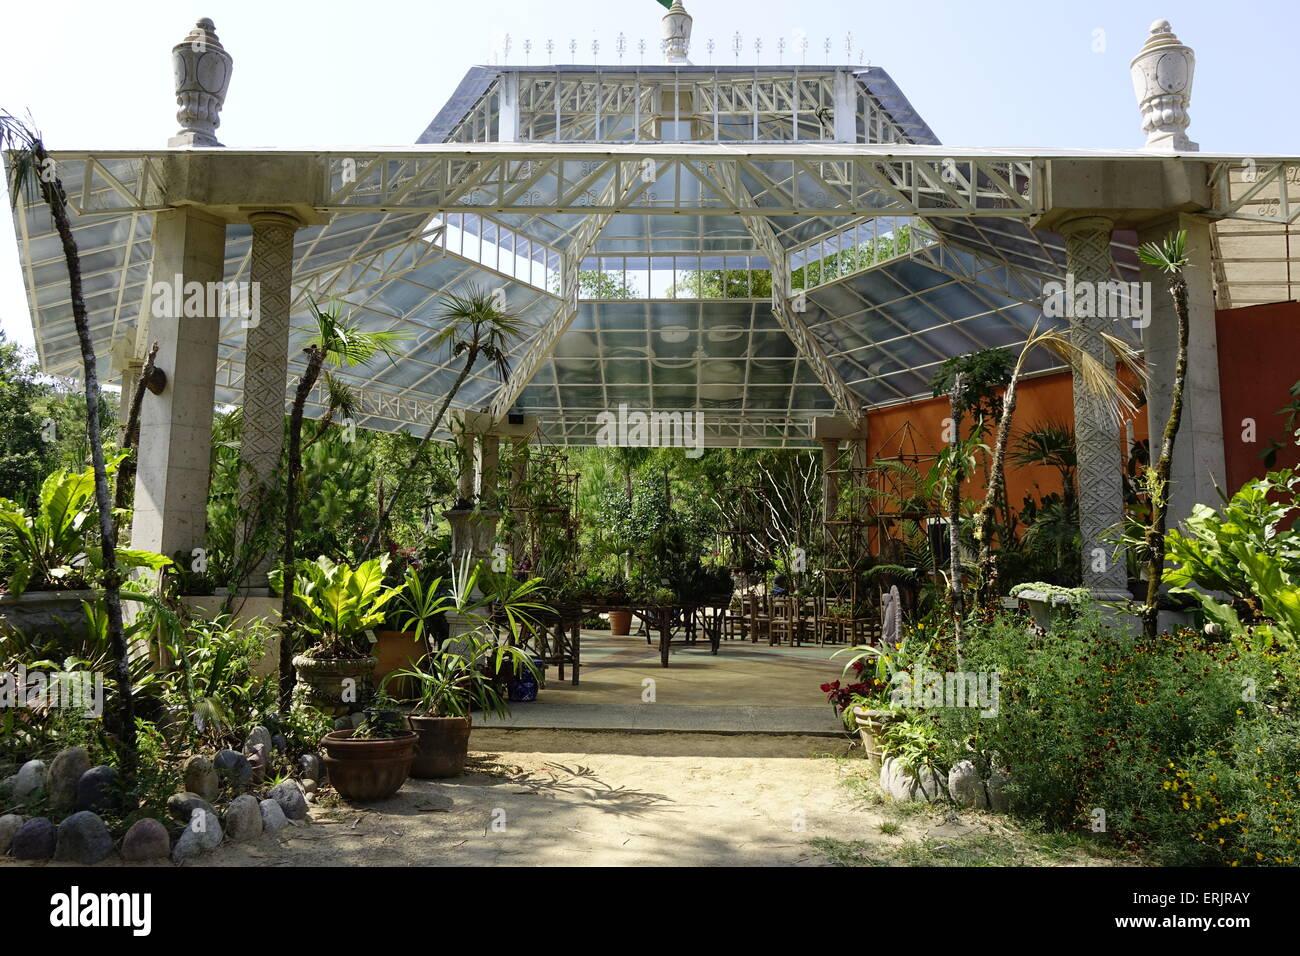 Genial Conservatory, Vallarta Botanical Gardens, Puerto Vallarta, Mexico